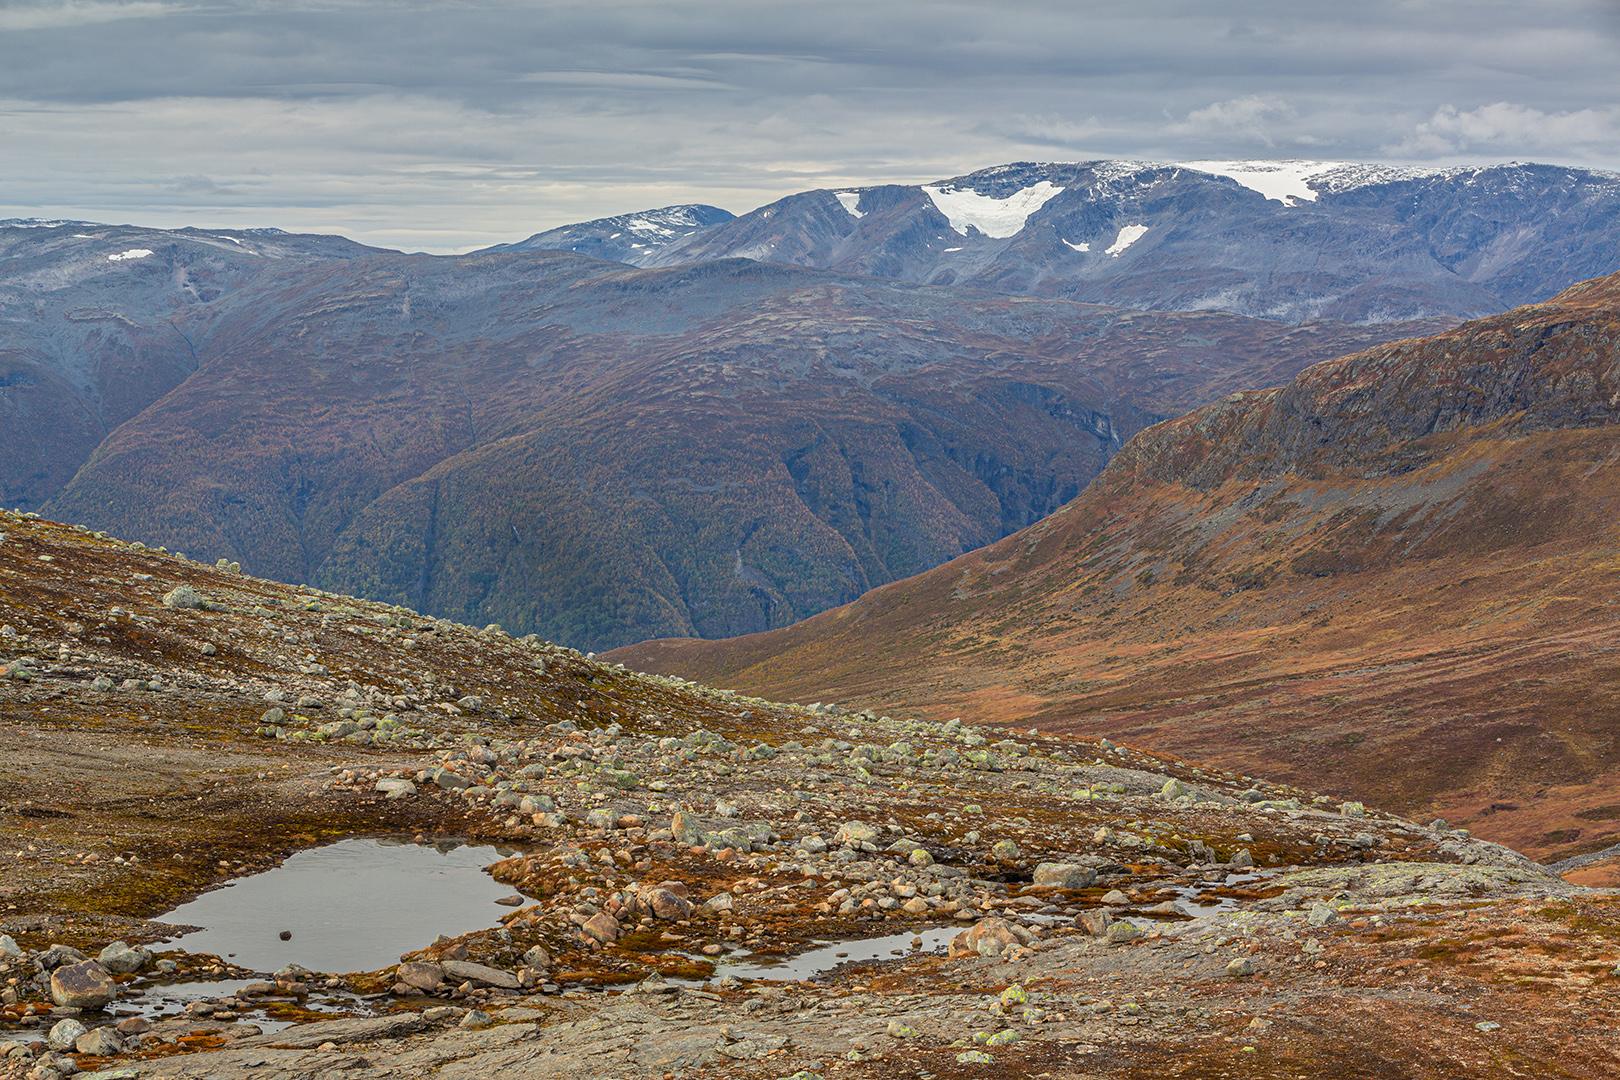 0339 Aurlandsfjellet 29-09-2013 B_nv_1620